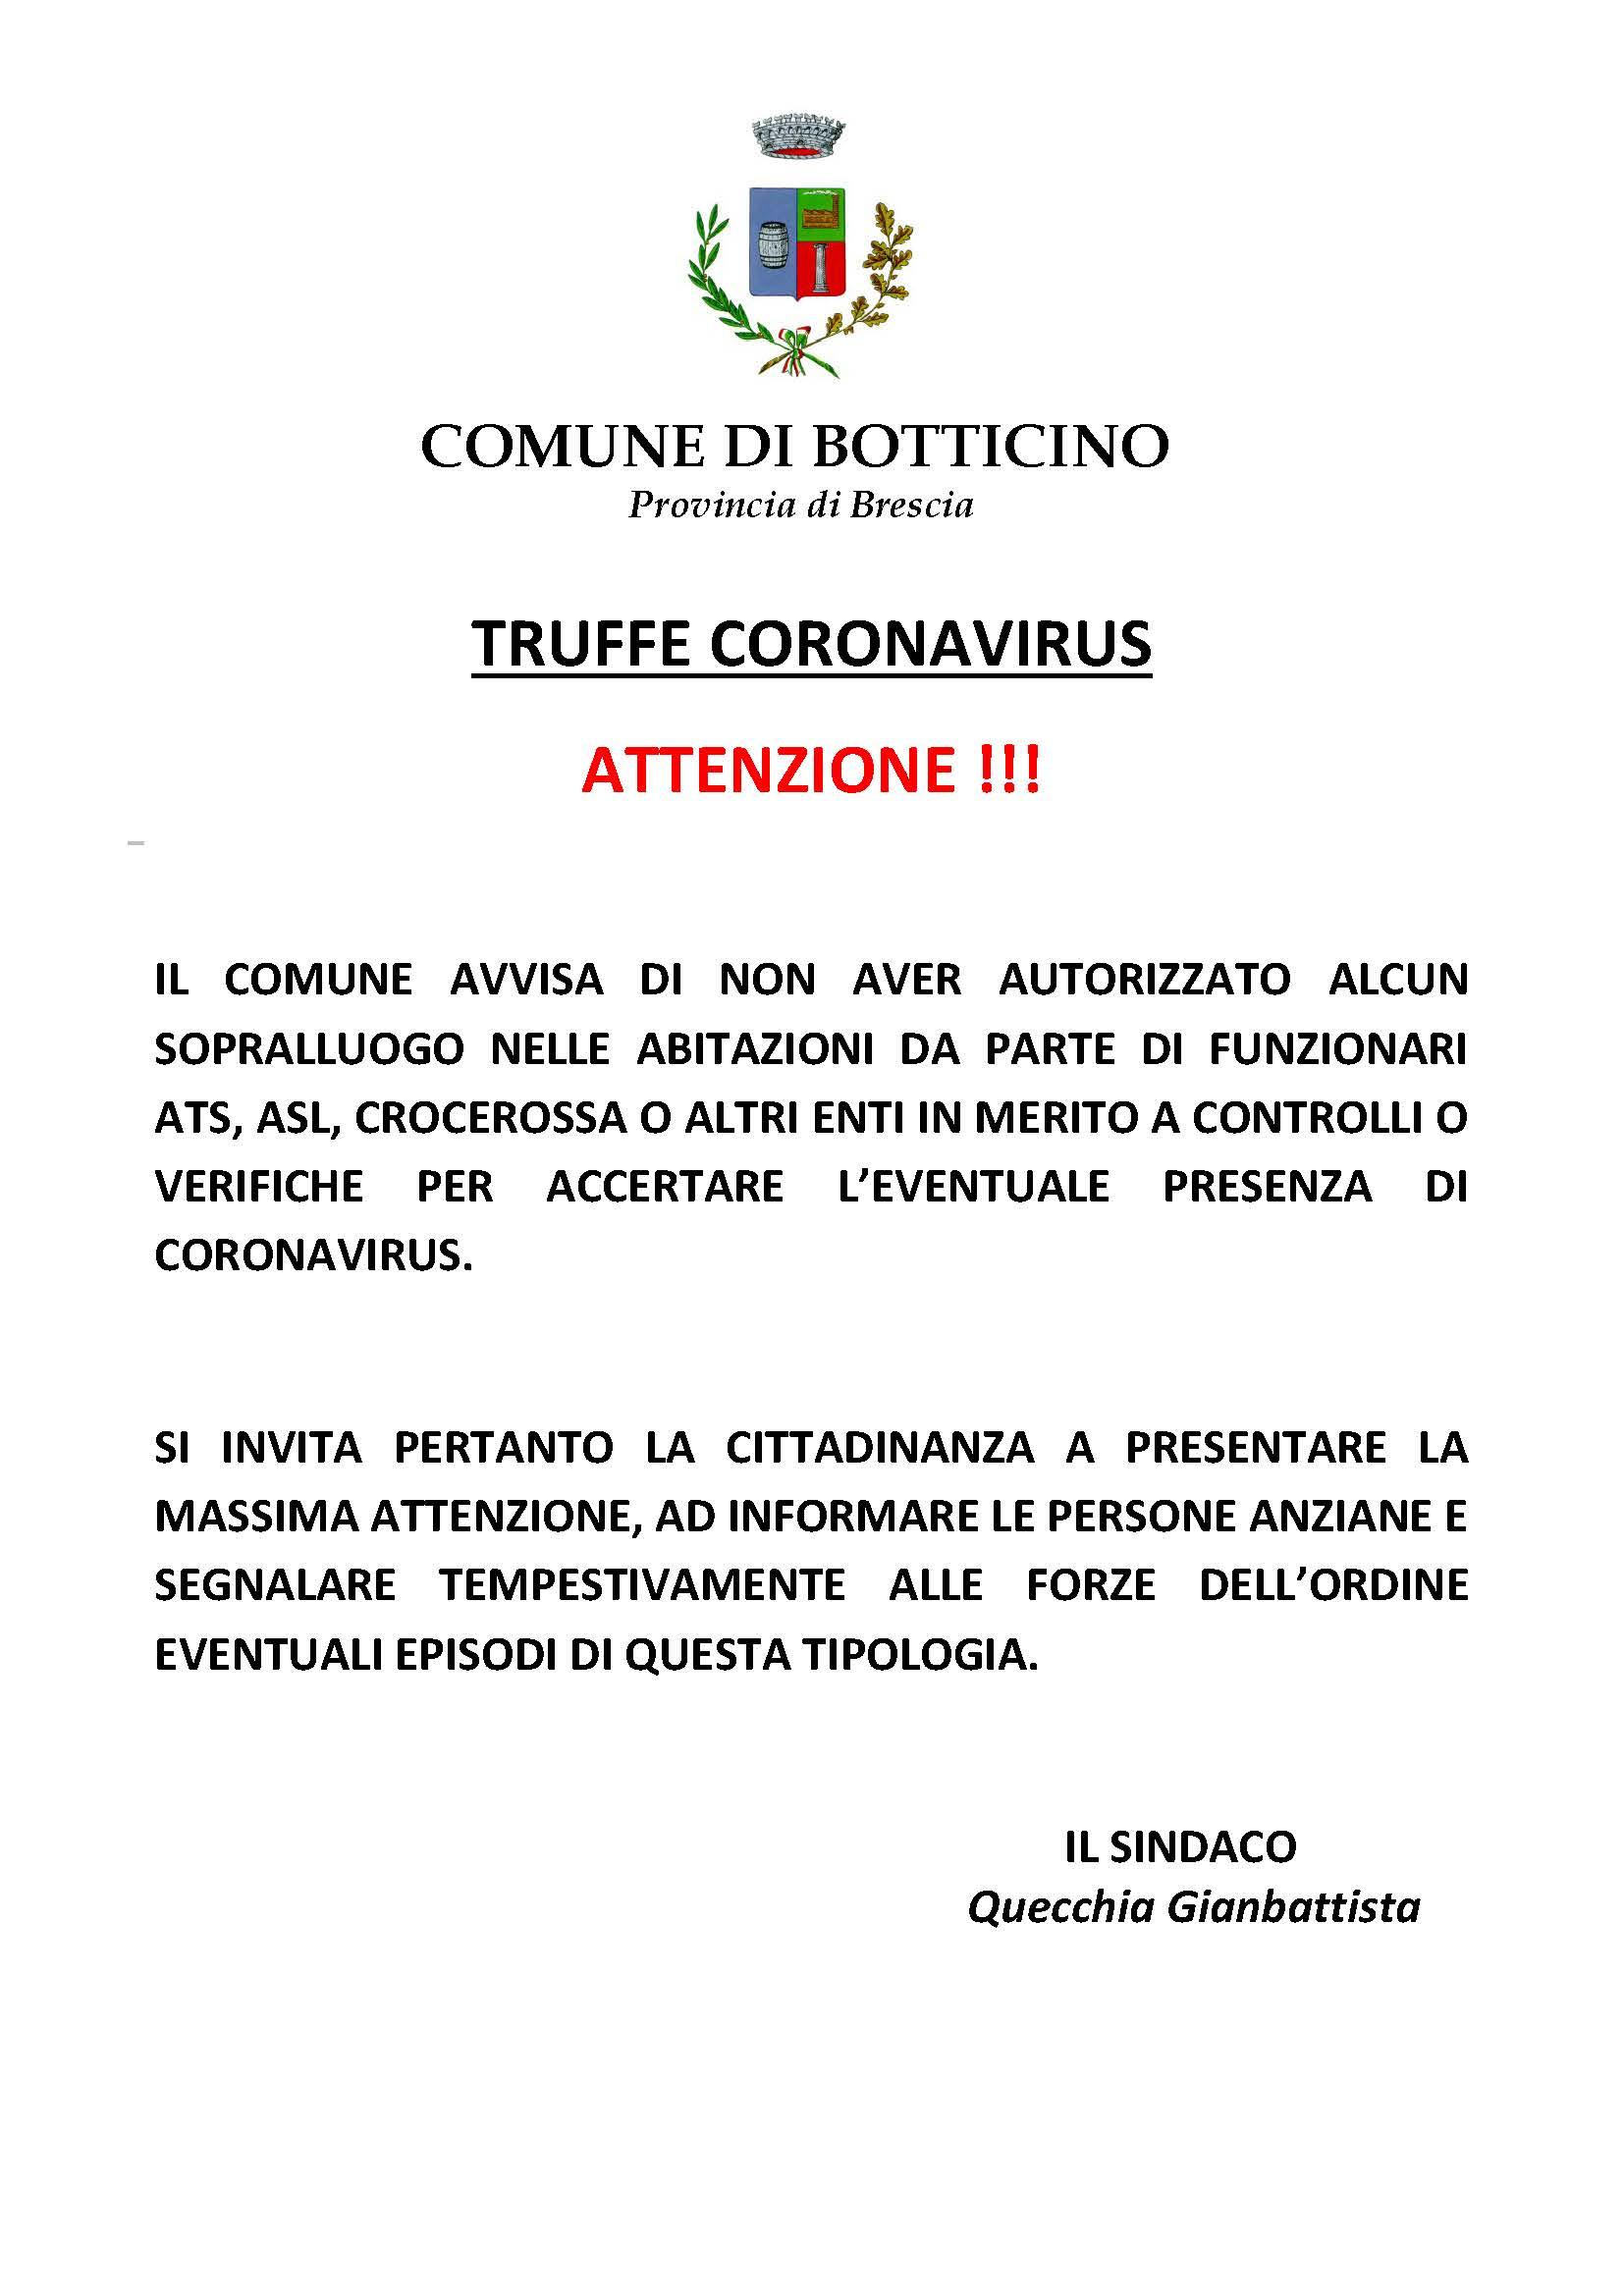 Coronavirus: Avviso per possibili truffe